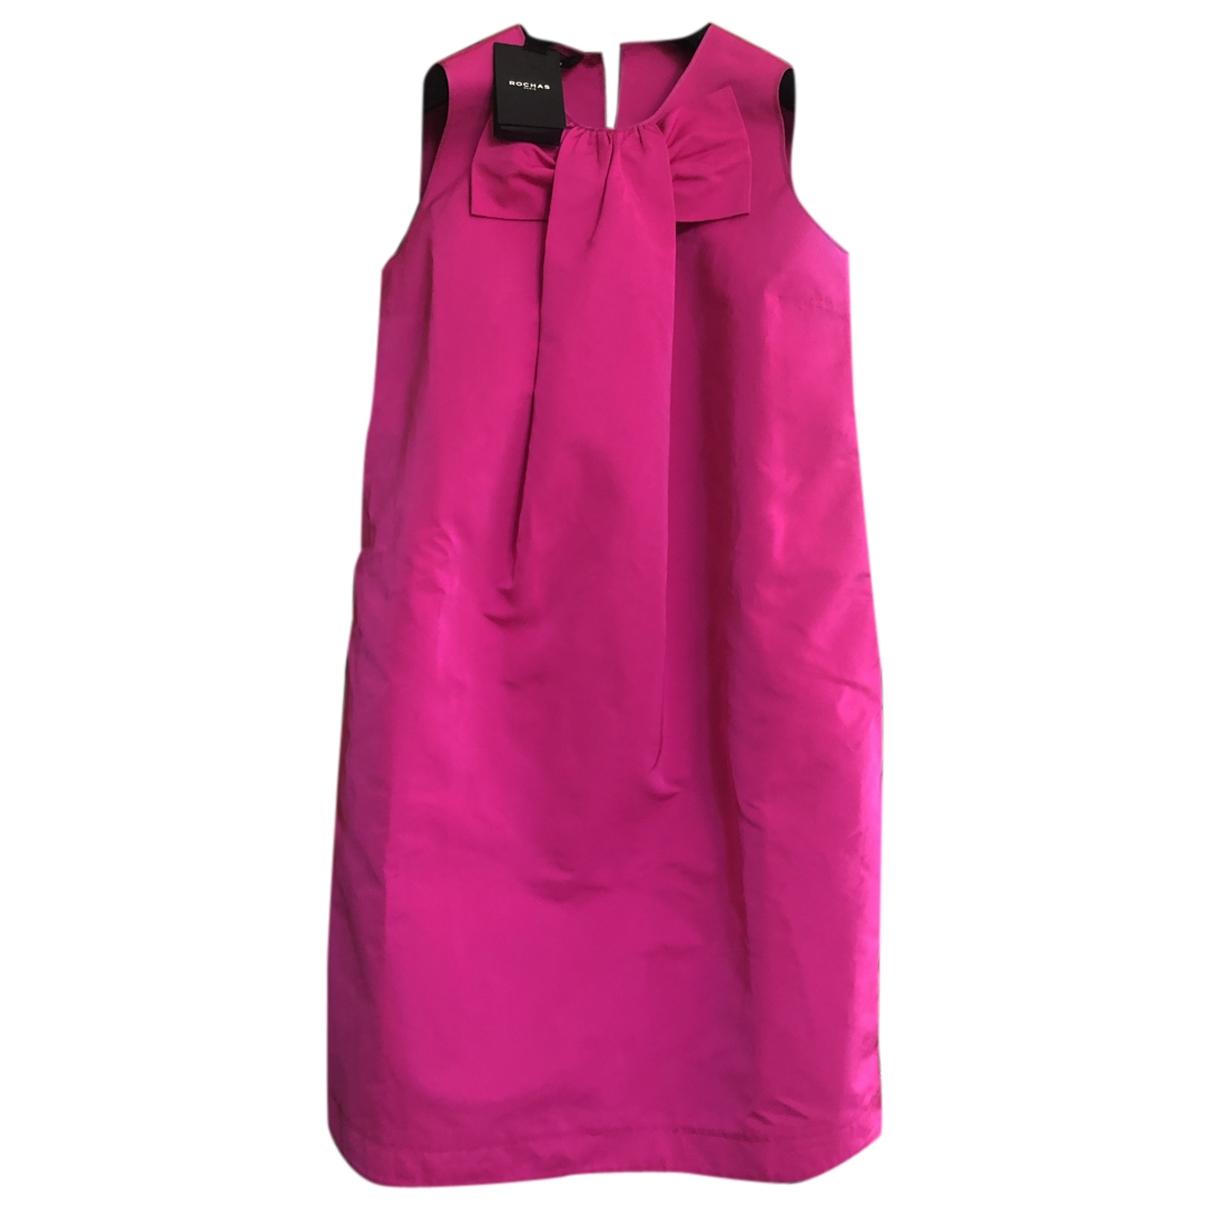 Rochas \N Pink dress for Women 38 FR